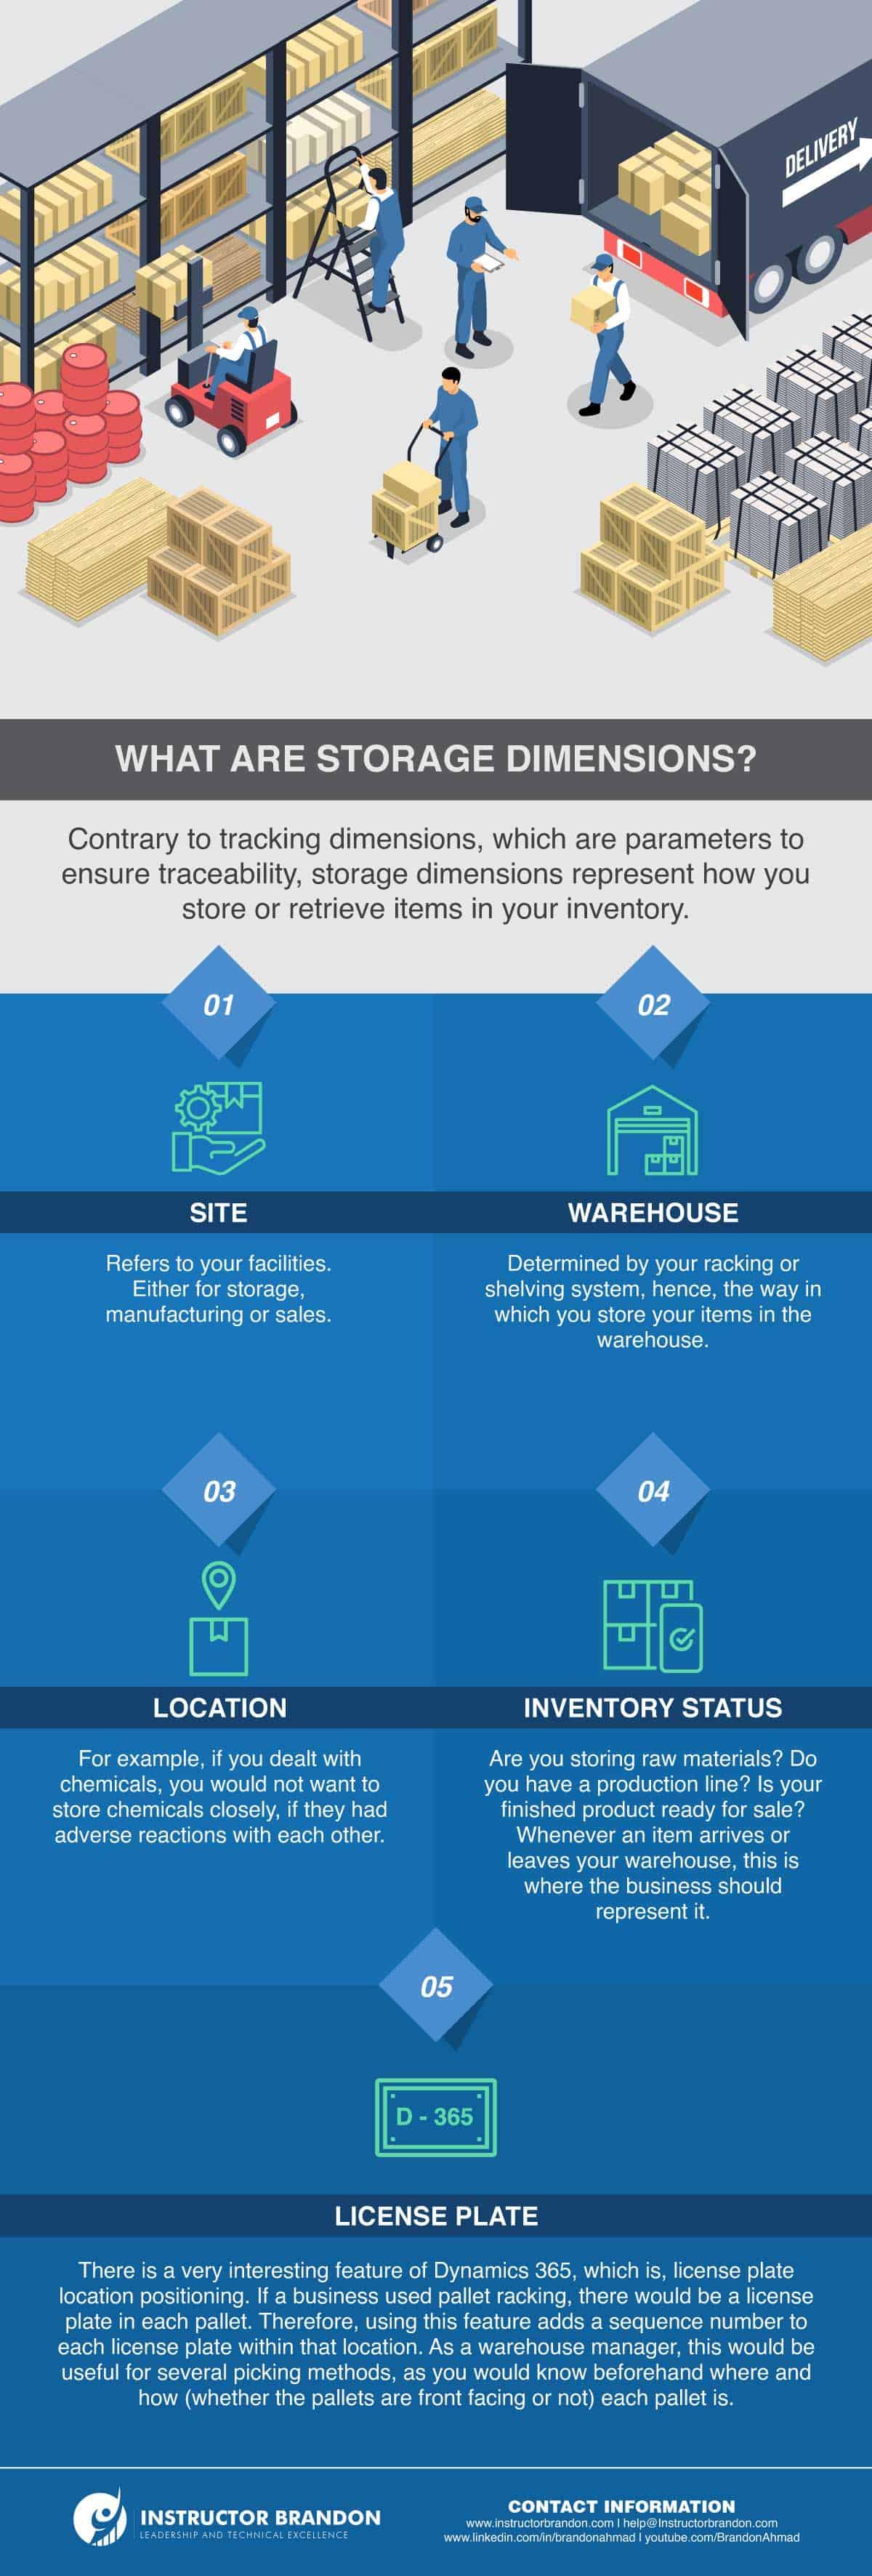 ms dynamics 365 storage dimension